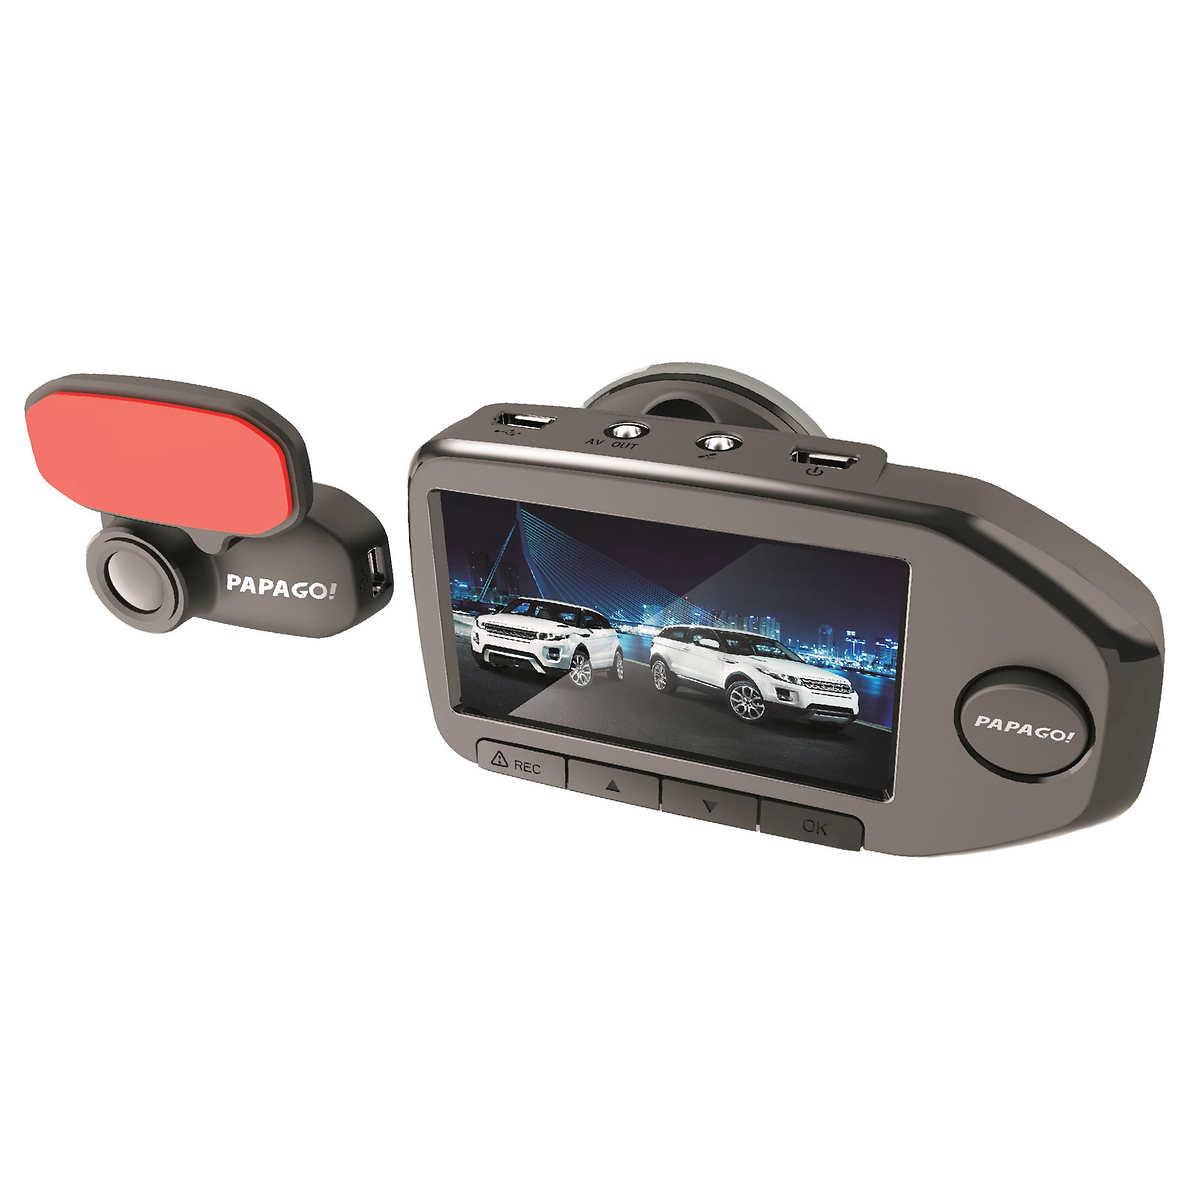 Papago gosafe 760 dual lens dash cam with 32 gb microsd card